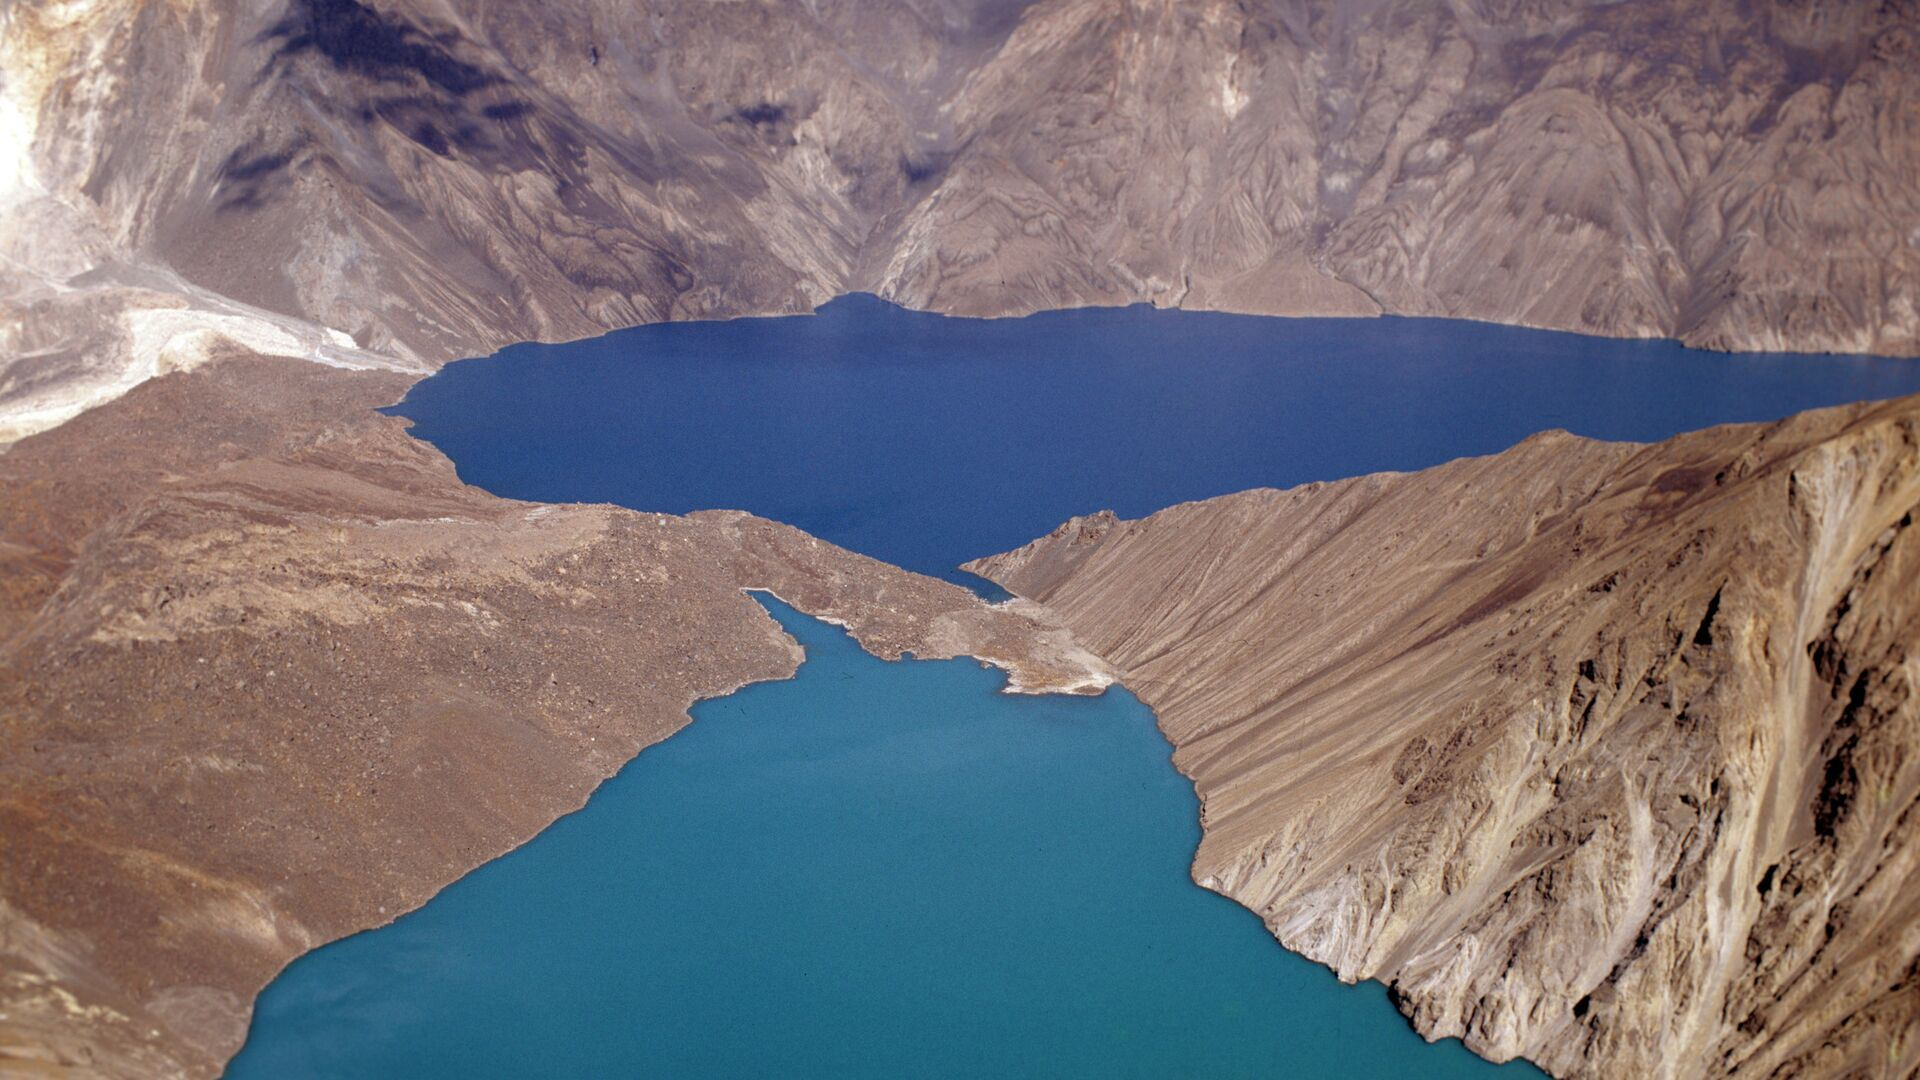 Сарезское озеро - Sputnik Таджикистан, 1920, 11.02.2021